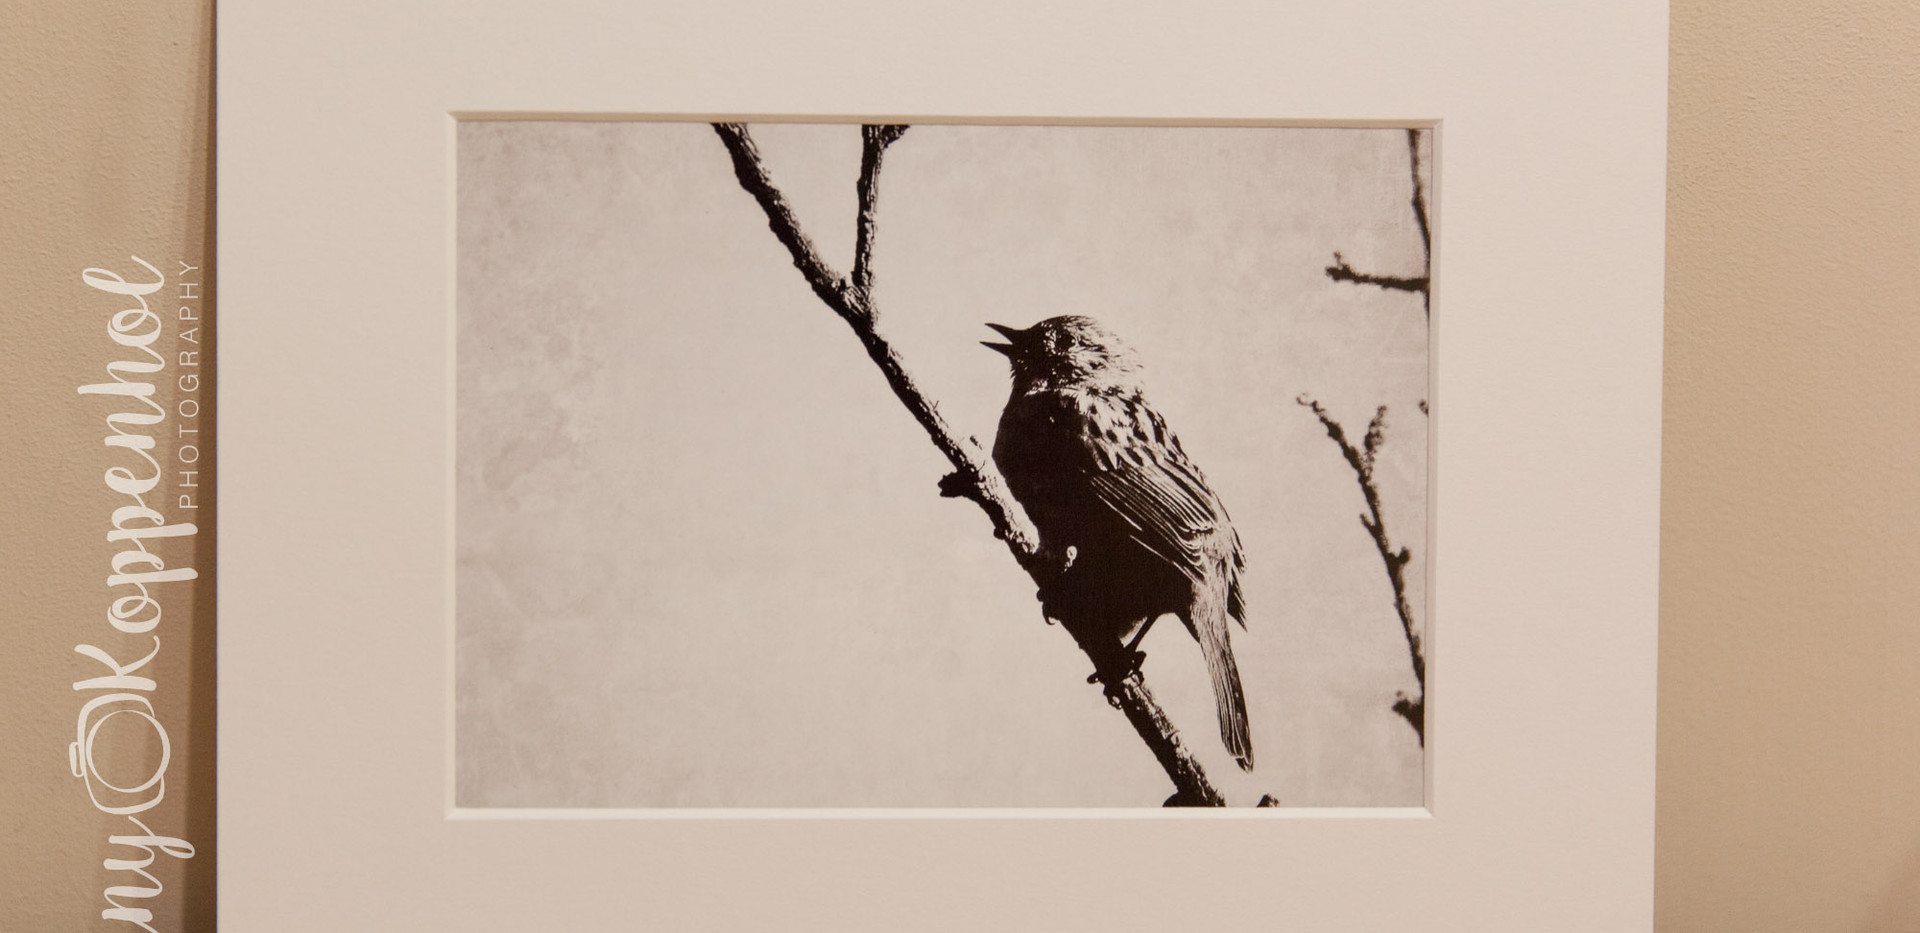 Songbird (Black & White)